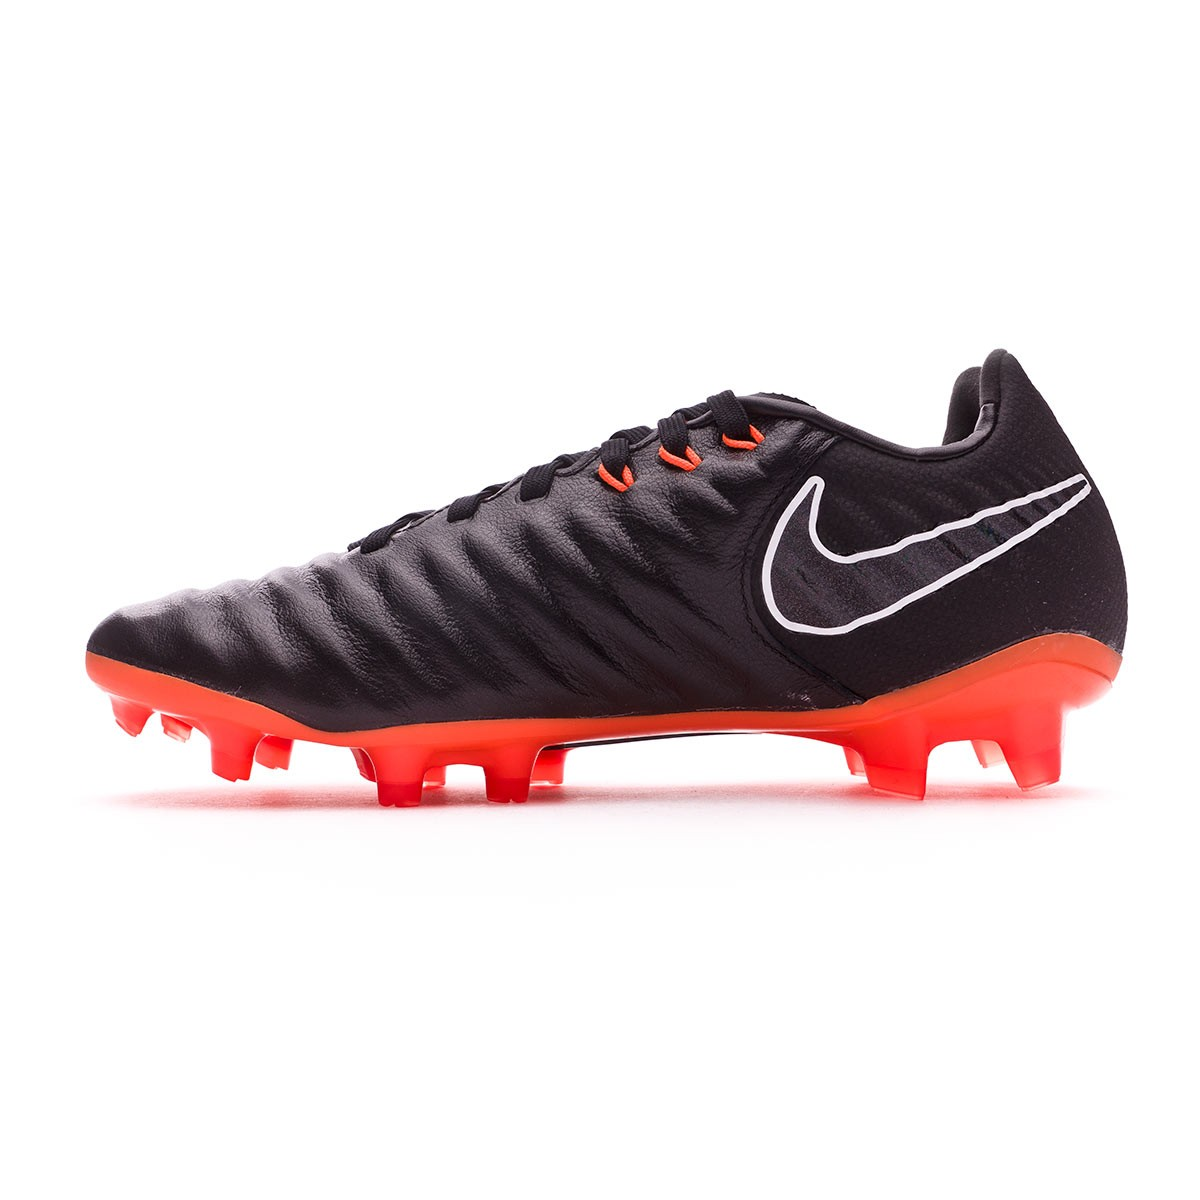 buy popular a4d01 3ad7a Bota Tiempo Legend VII Elite FG Niño Black-Total orange-Black-White